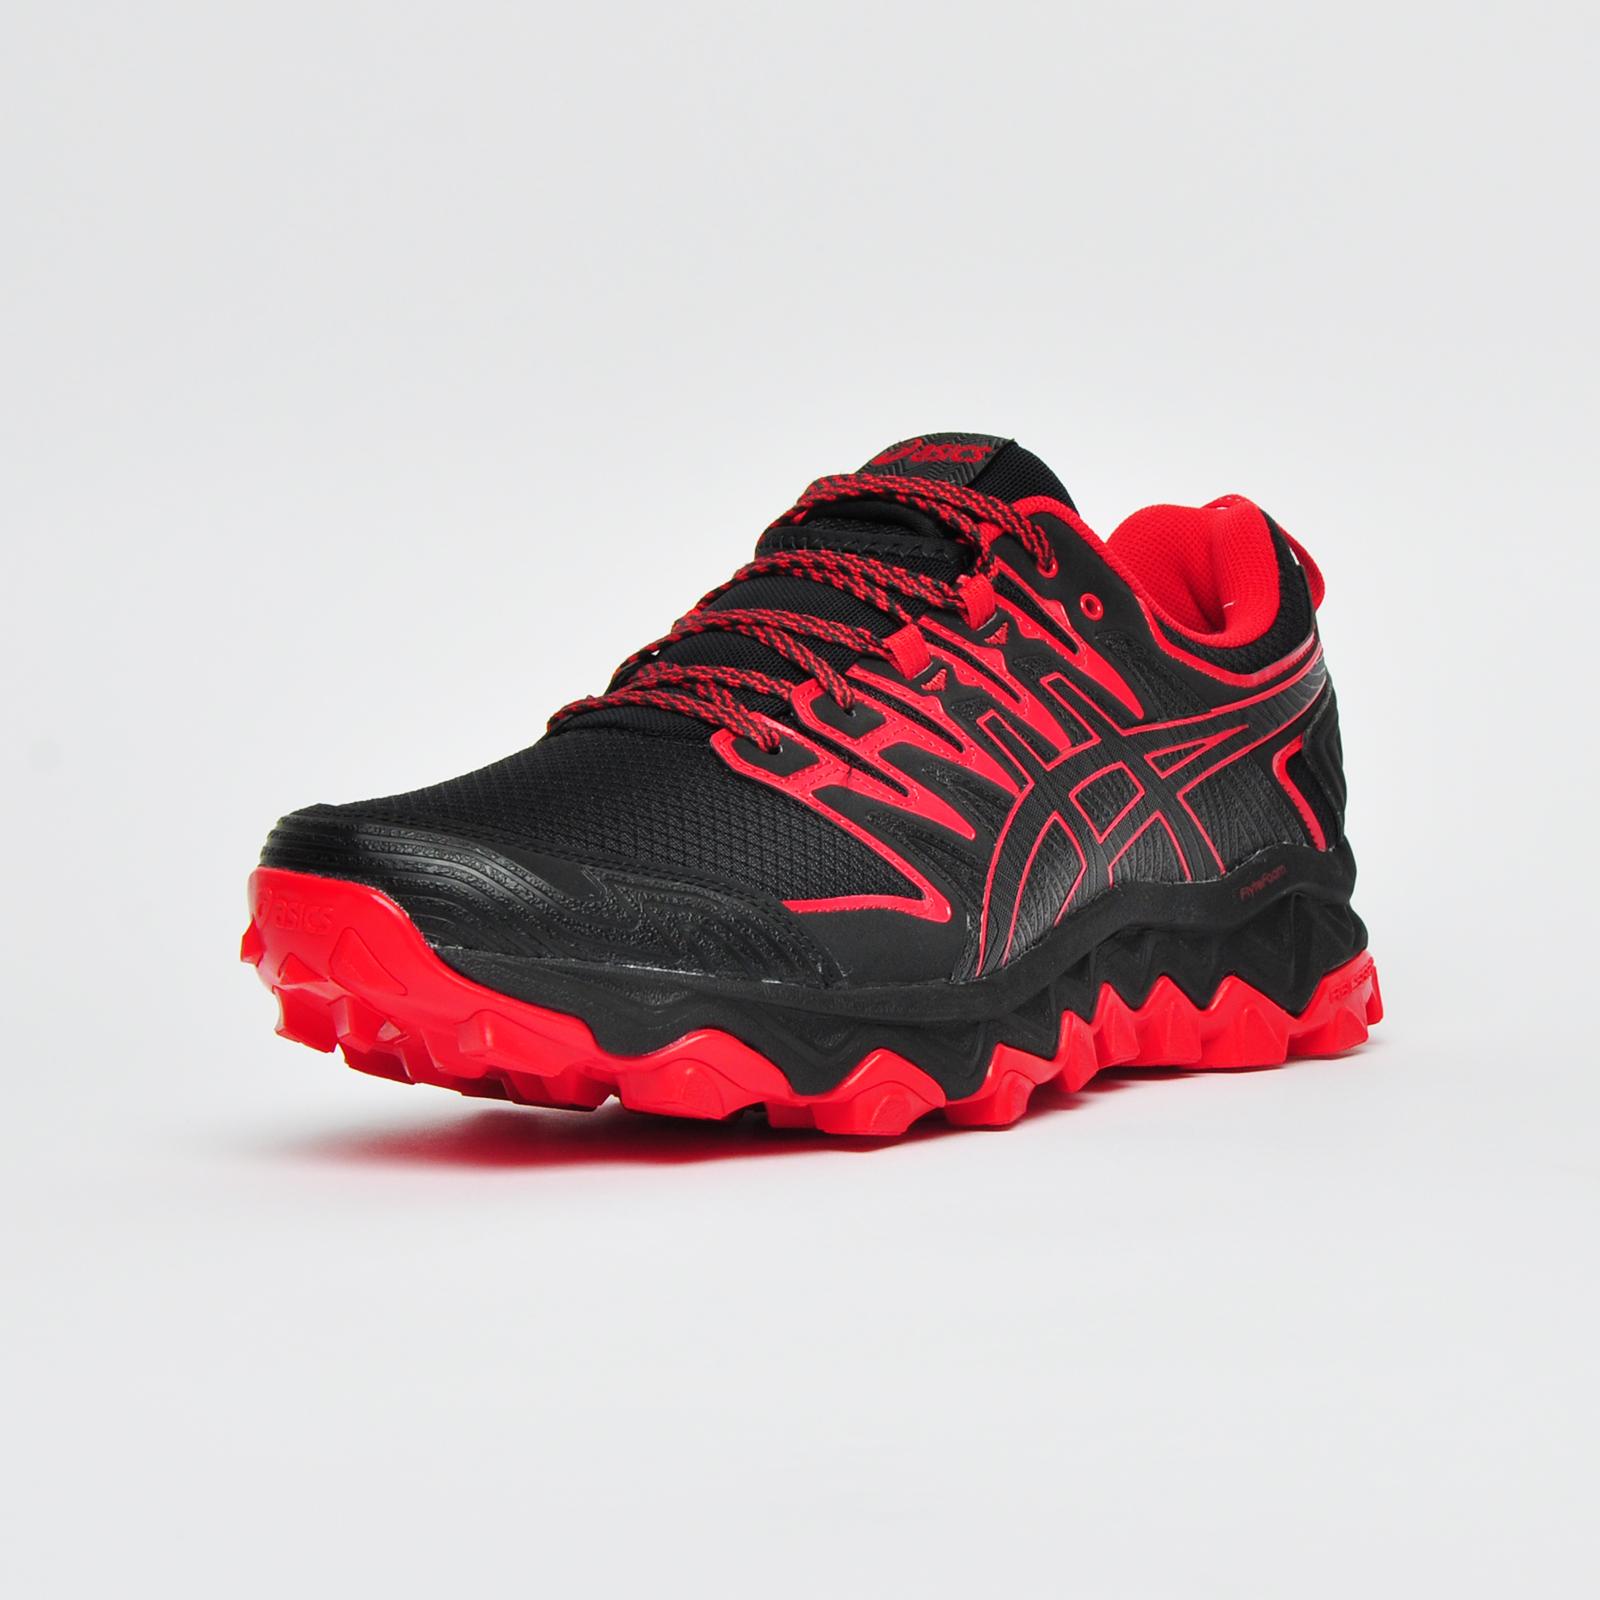 Asics FUJITRABUCO 7 Trail Running Shoes Mens